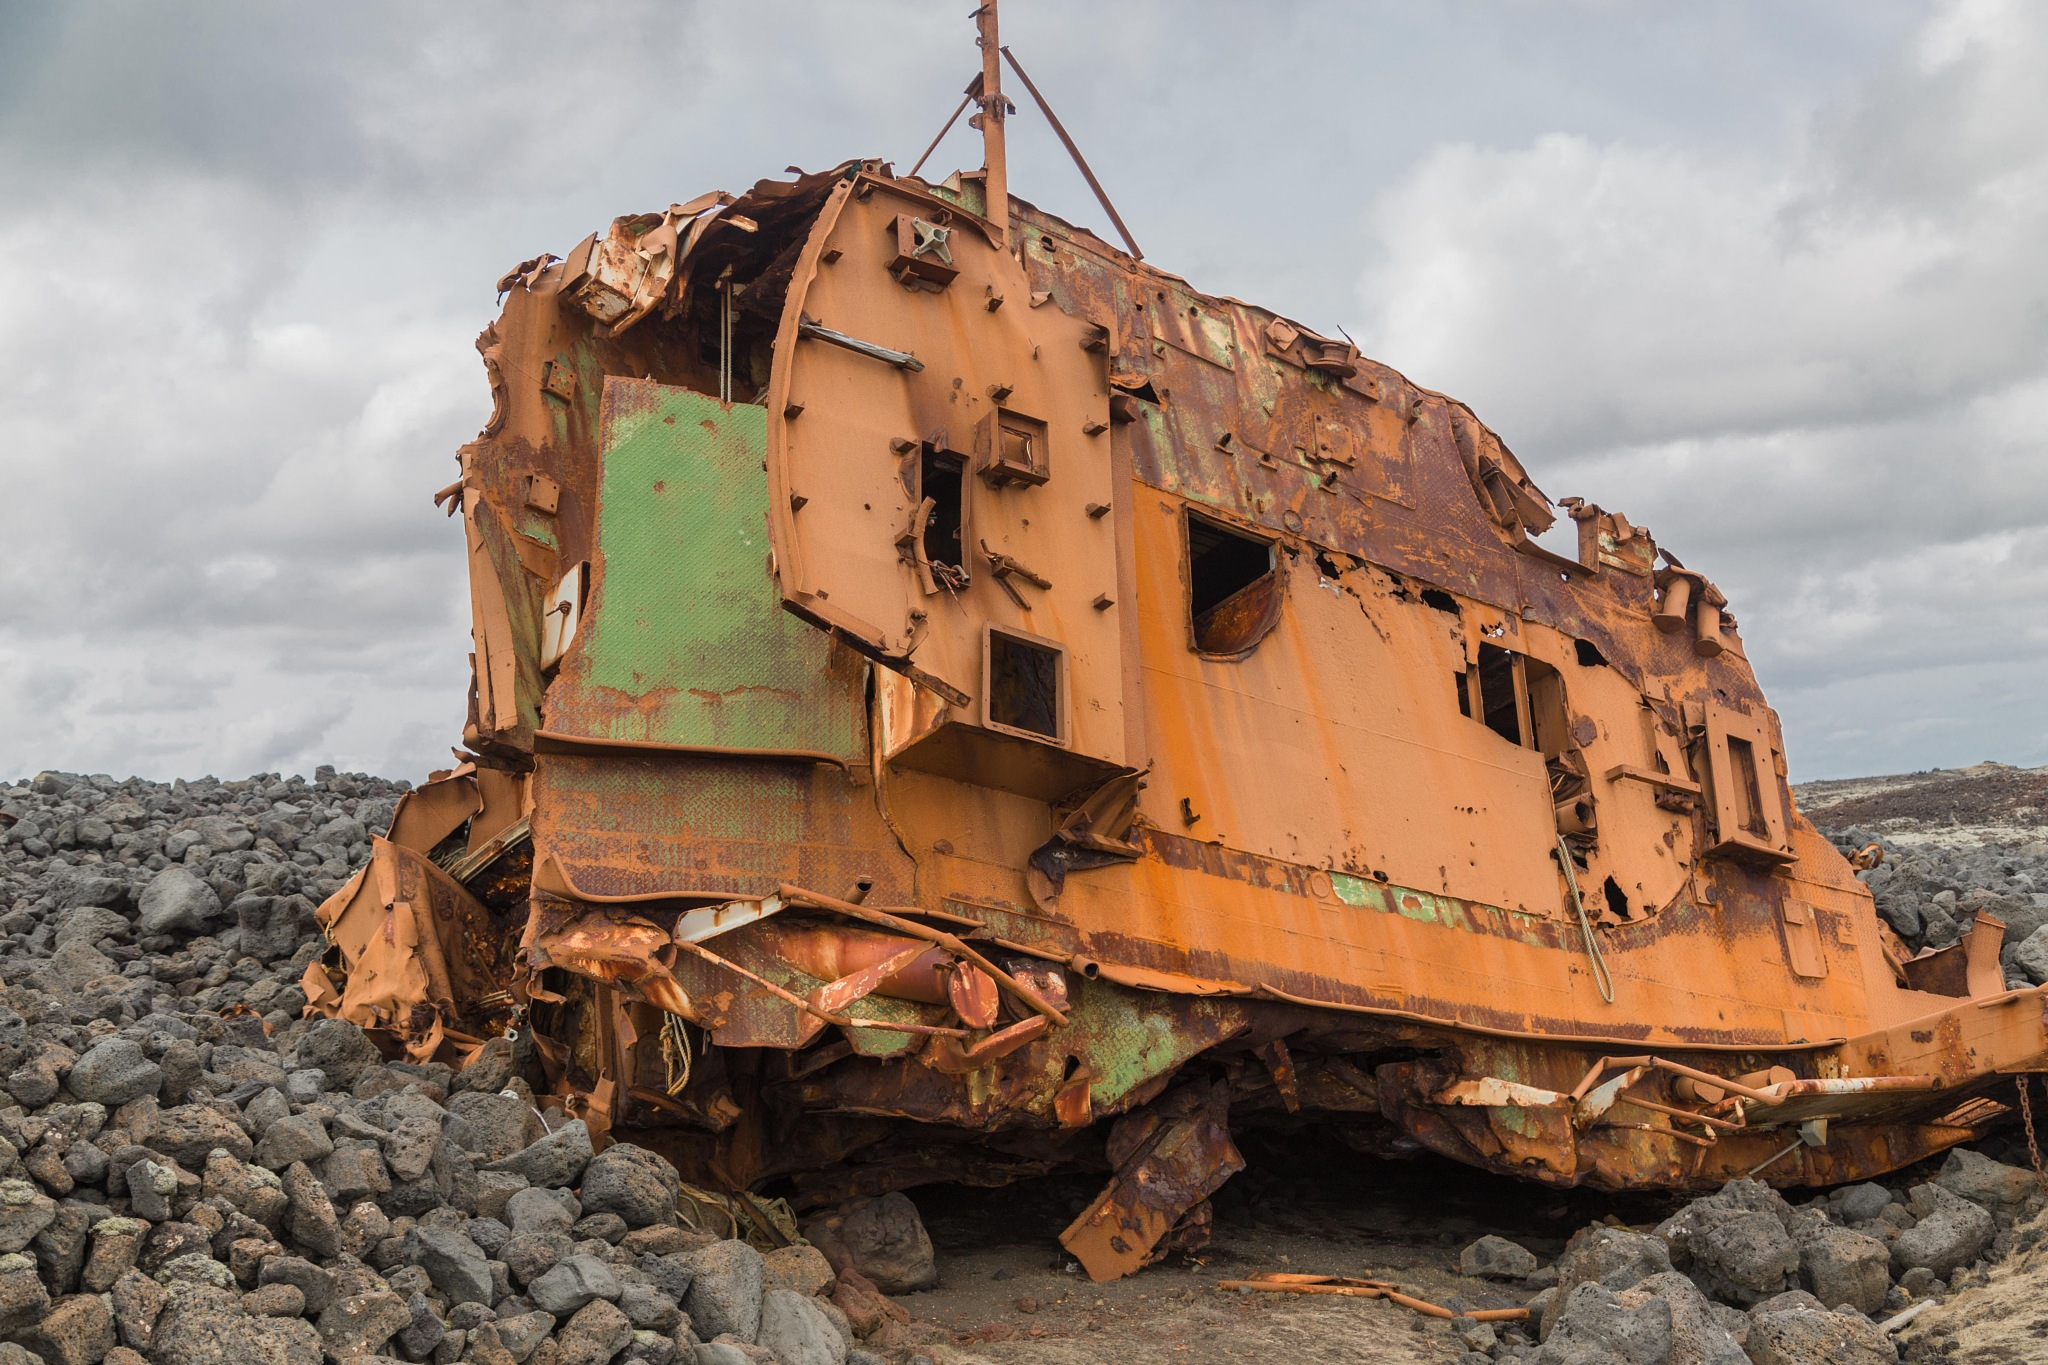 Shipwreck by charles desrosiers